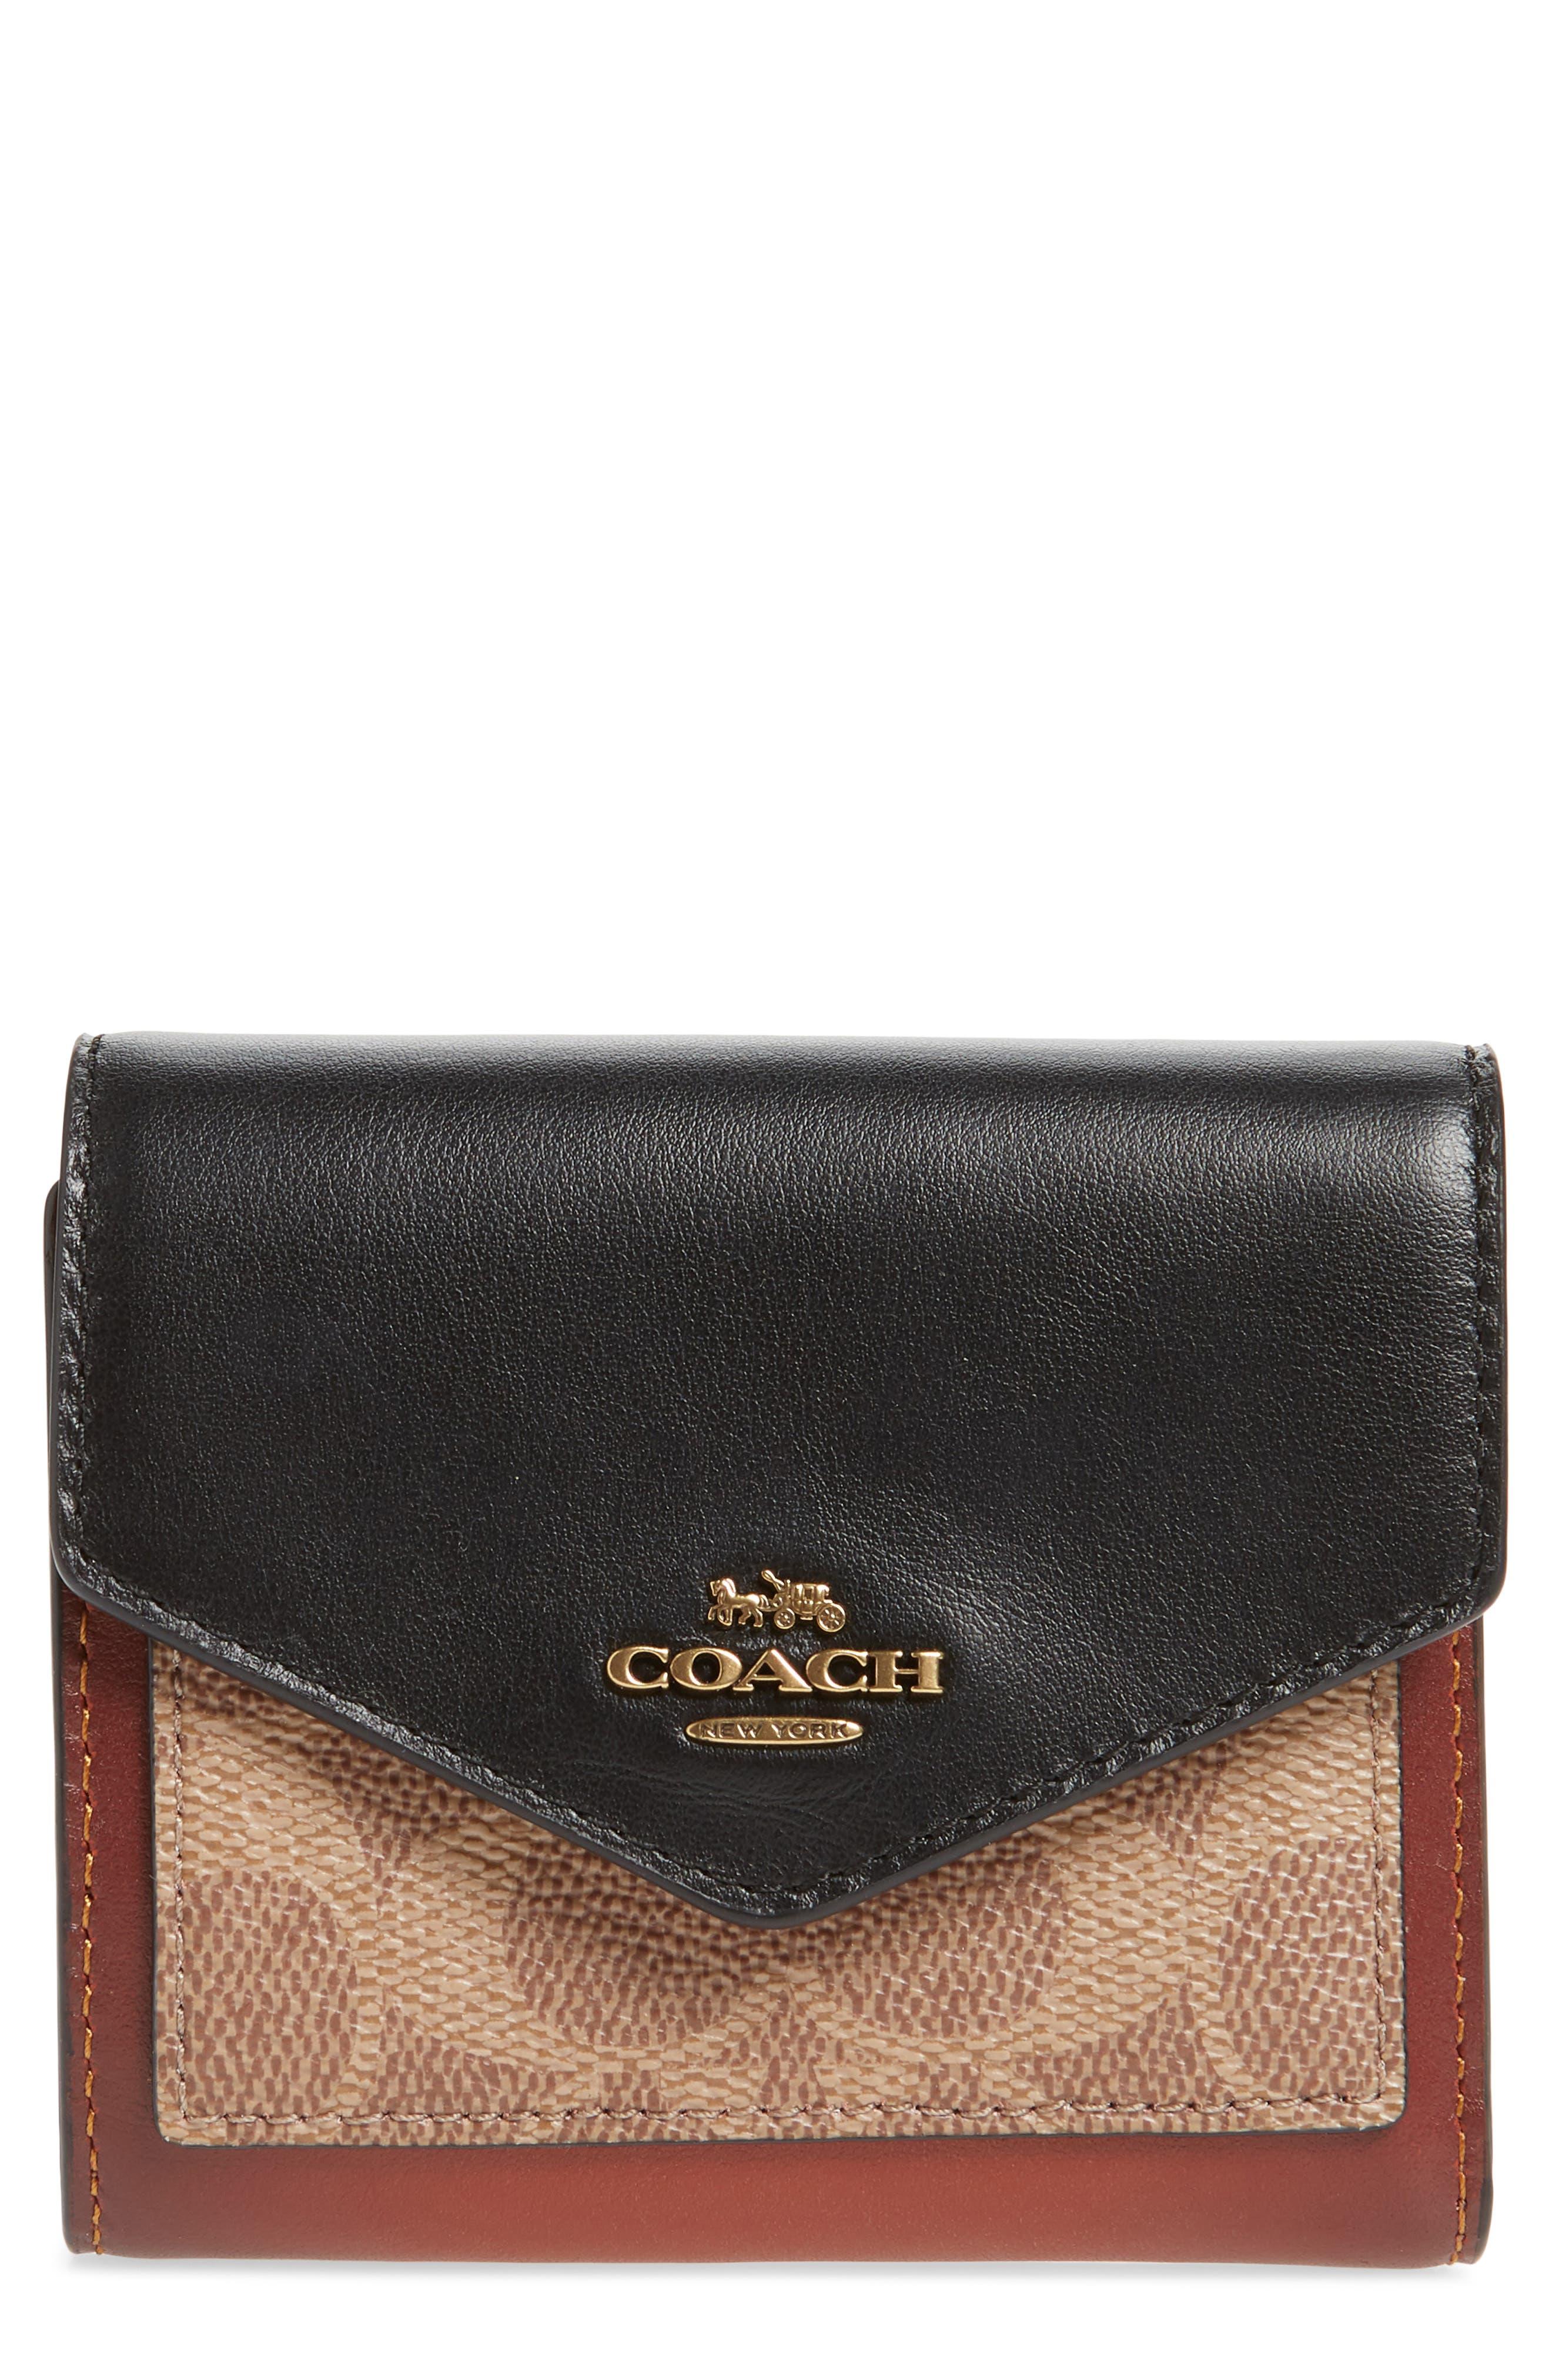 COACH, Leather & Signature Canvas Trifold Wallet, Main thumbnail 1, color, TAN BLACK